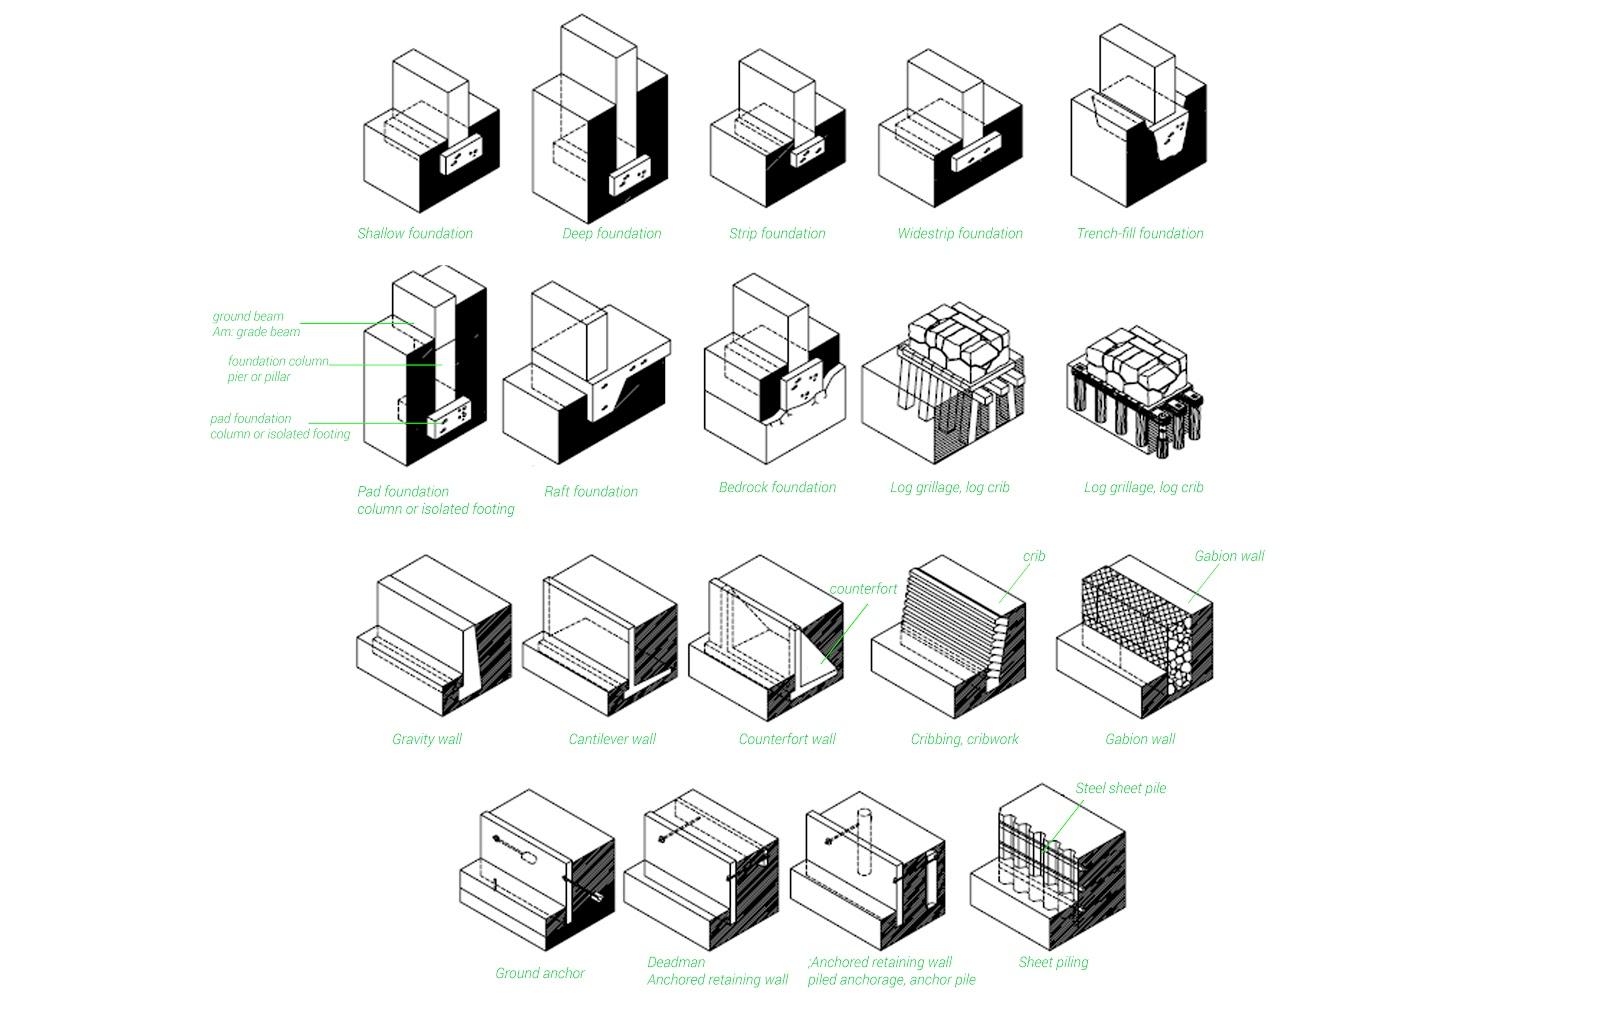 Architecture basics foundations the mind of architecture for Foundations types